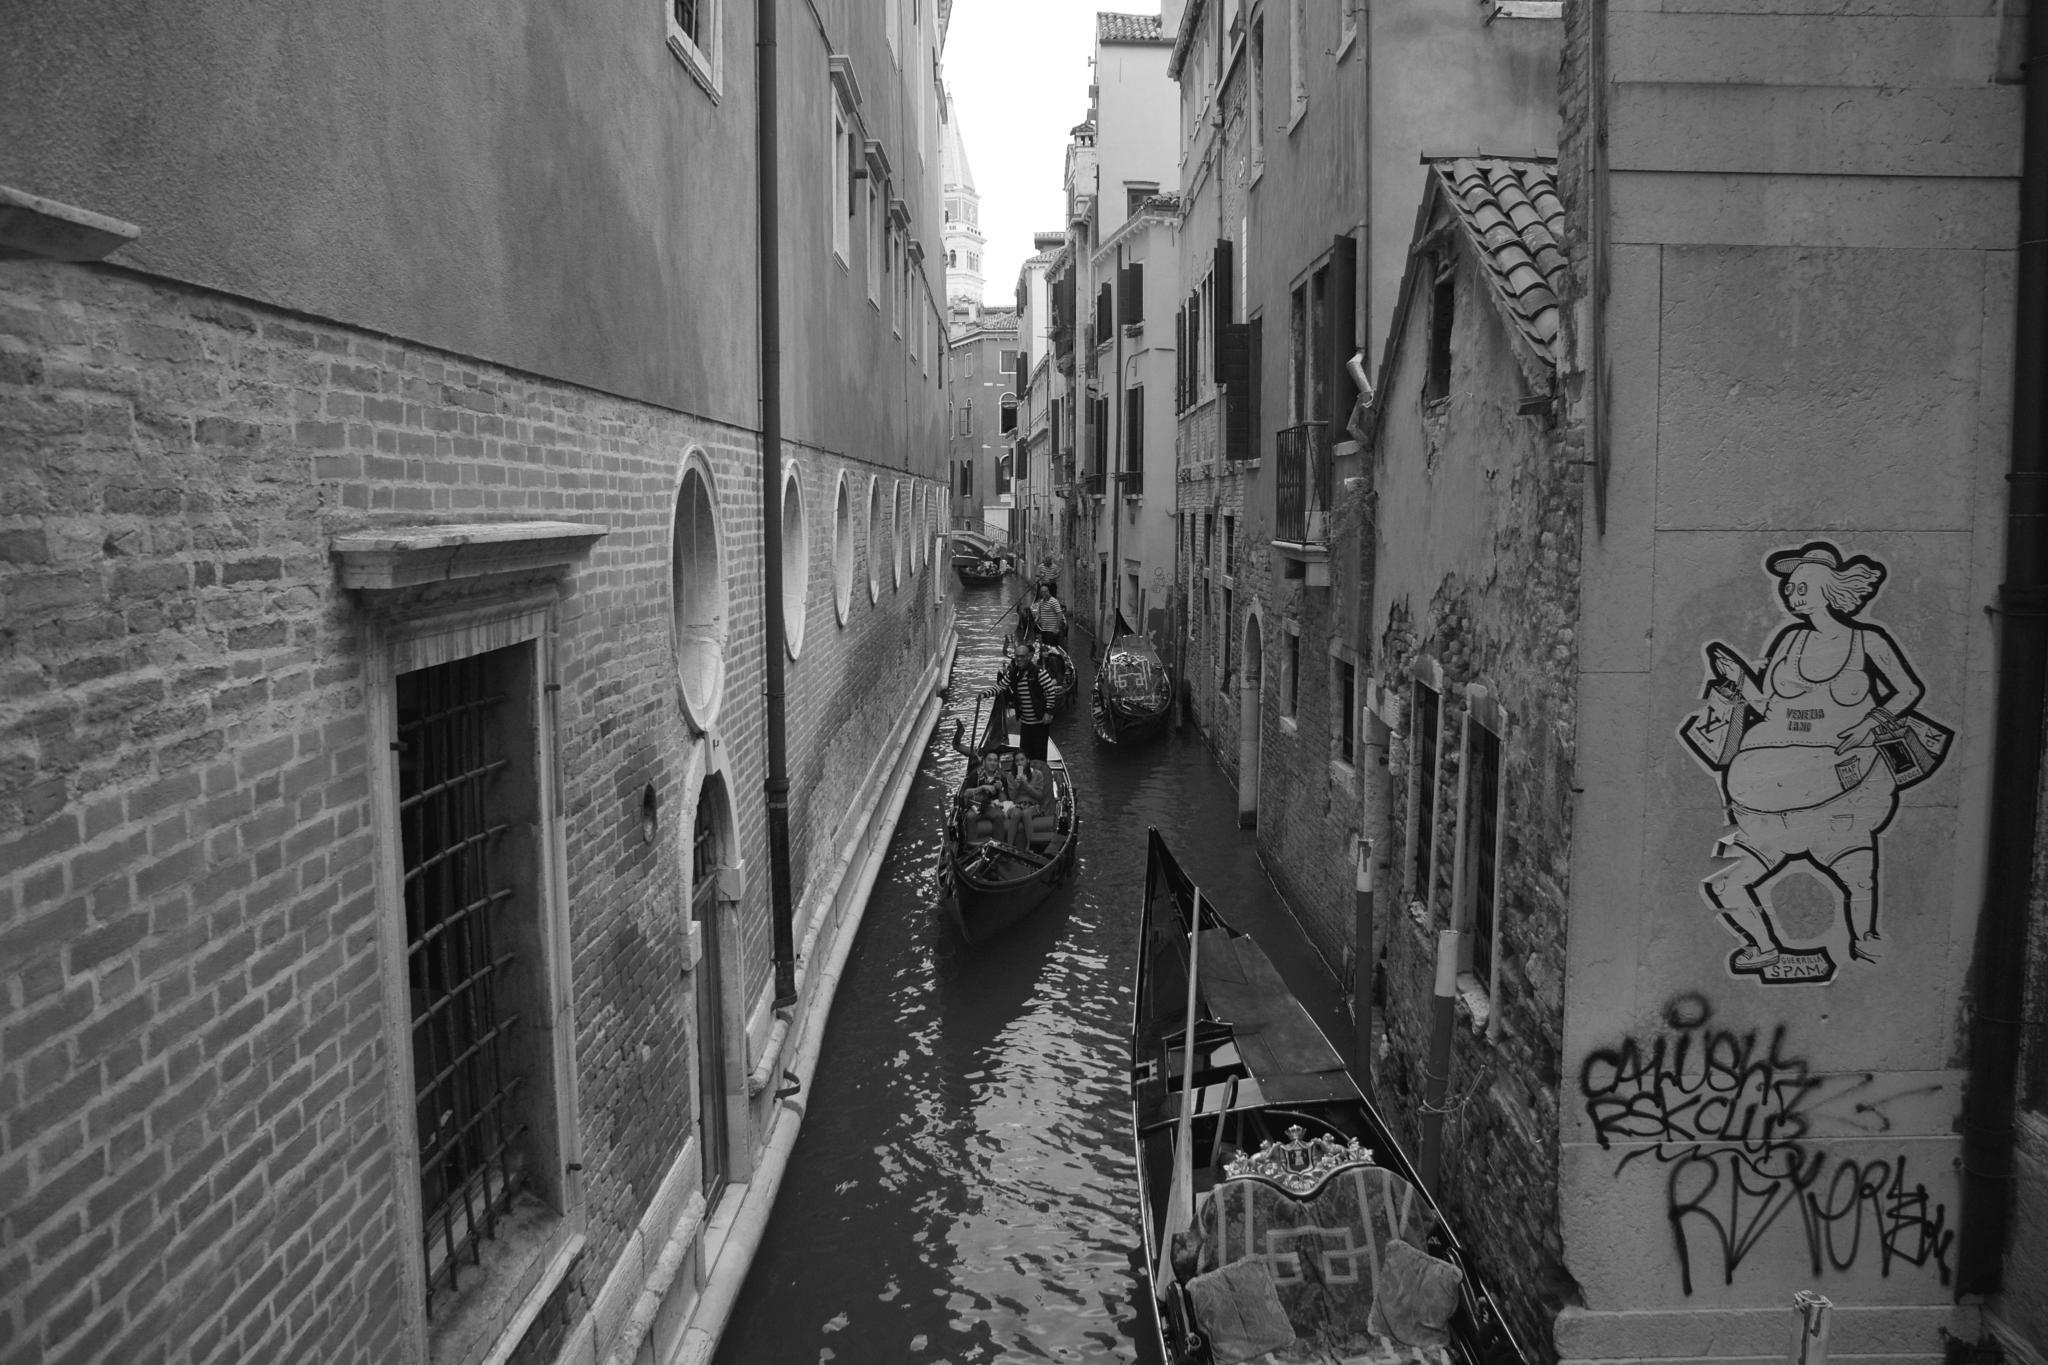 Traffic jam in Venice by nealmcveagh